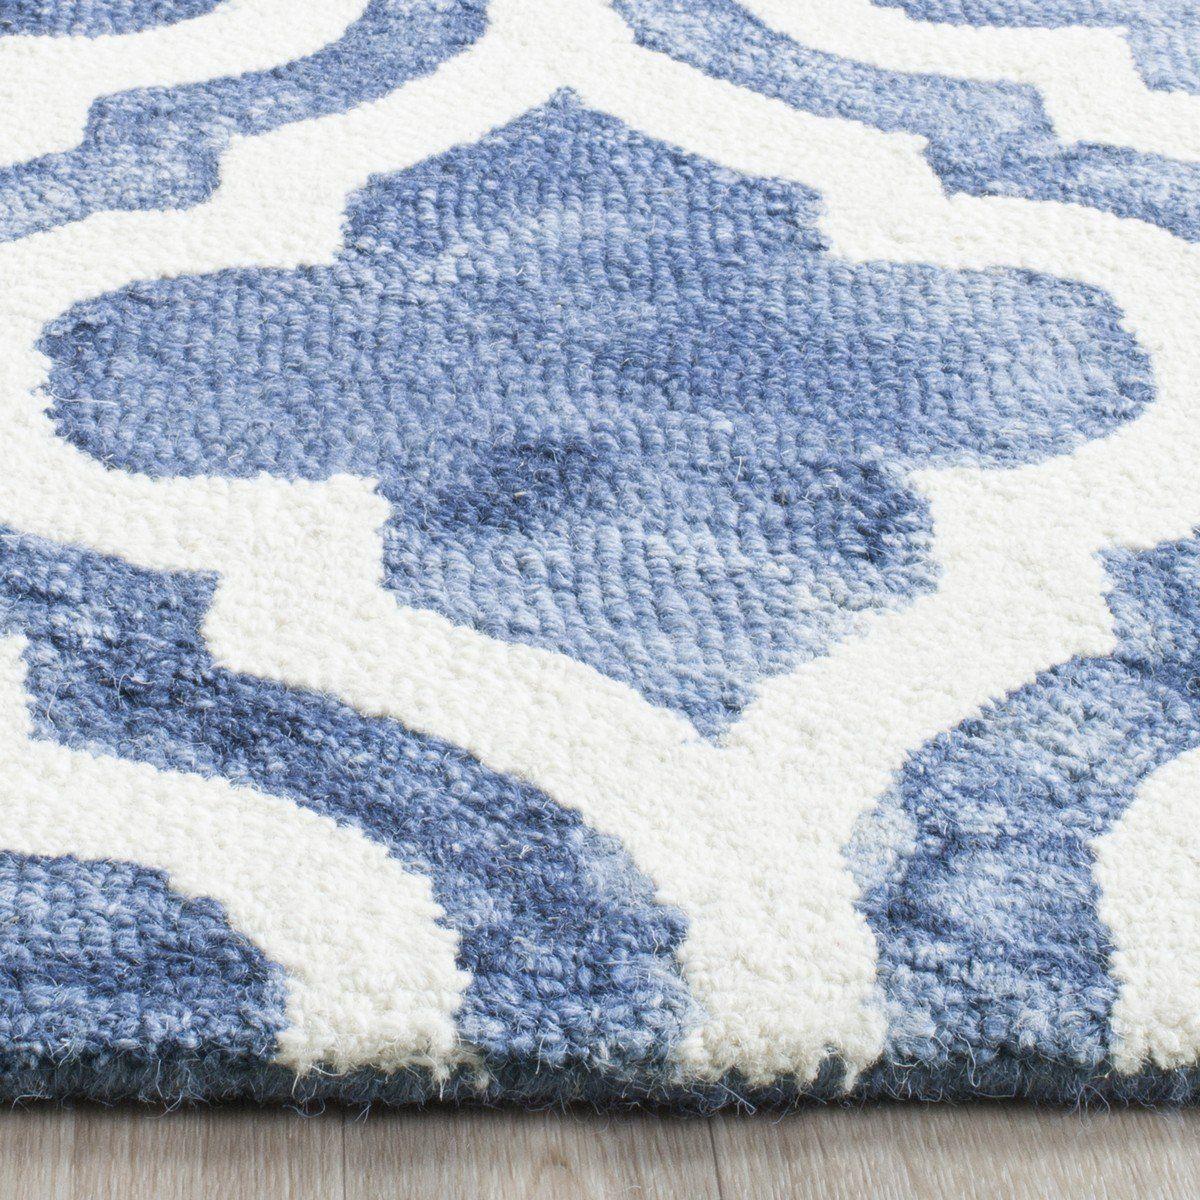 Safavieh Dip Dye Ddy537k Blue Ivory Wool Area Rugs Area Rugs Square Area Rugs